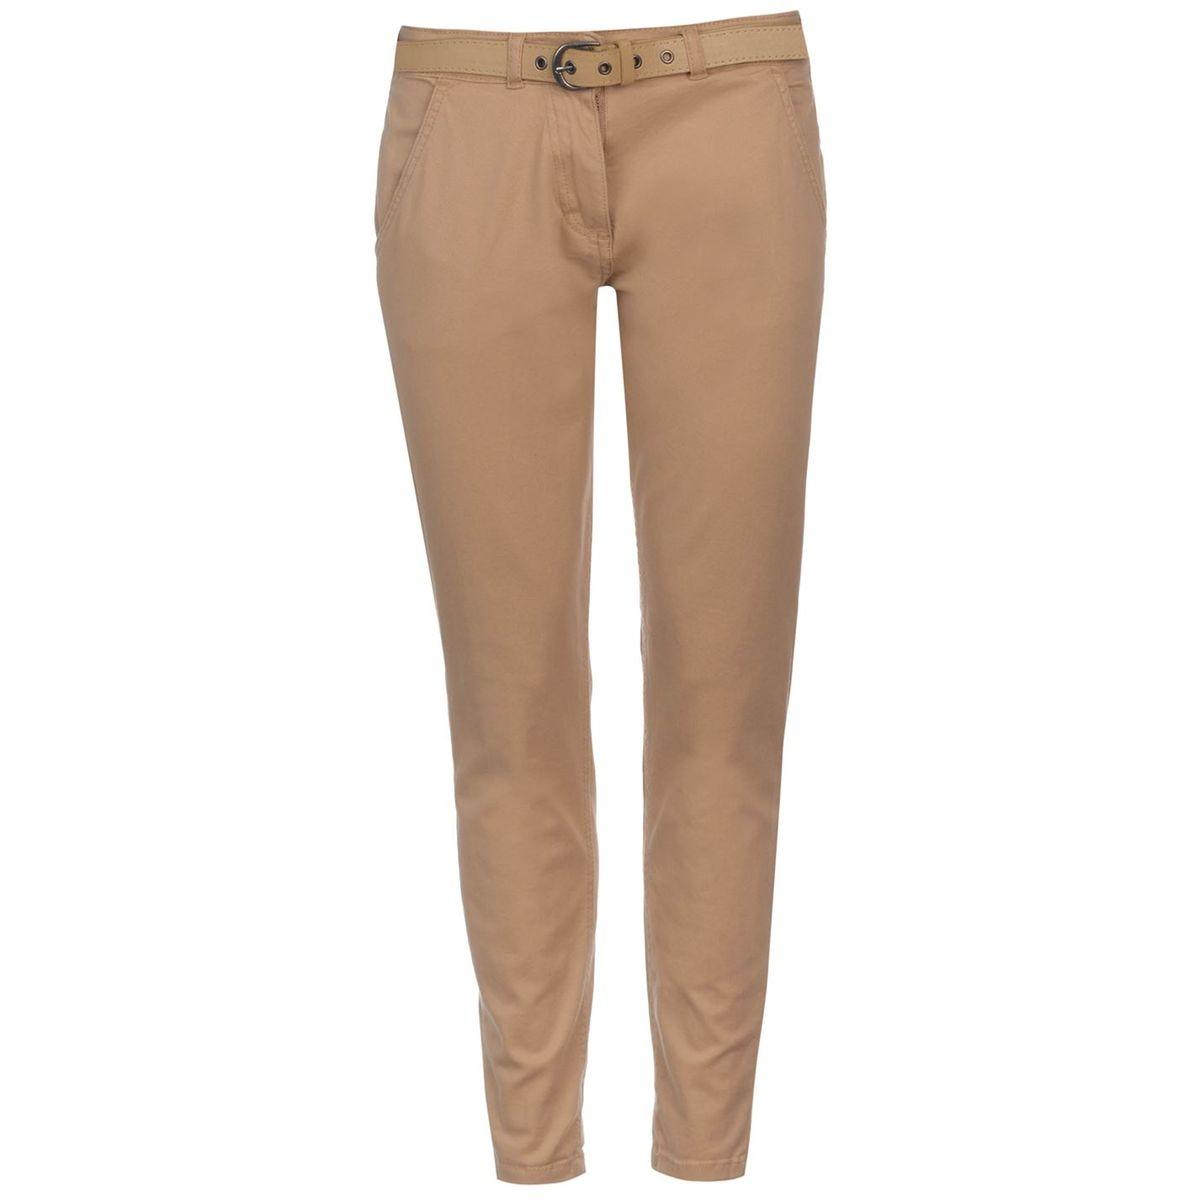 Pantalon chinos avec ceinture